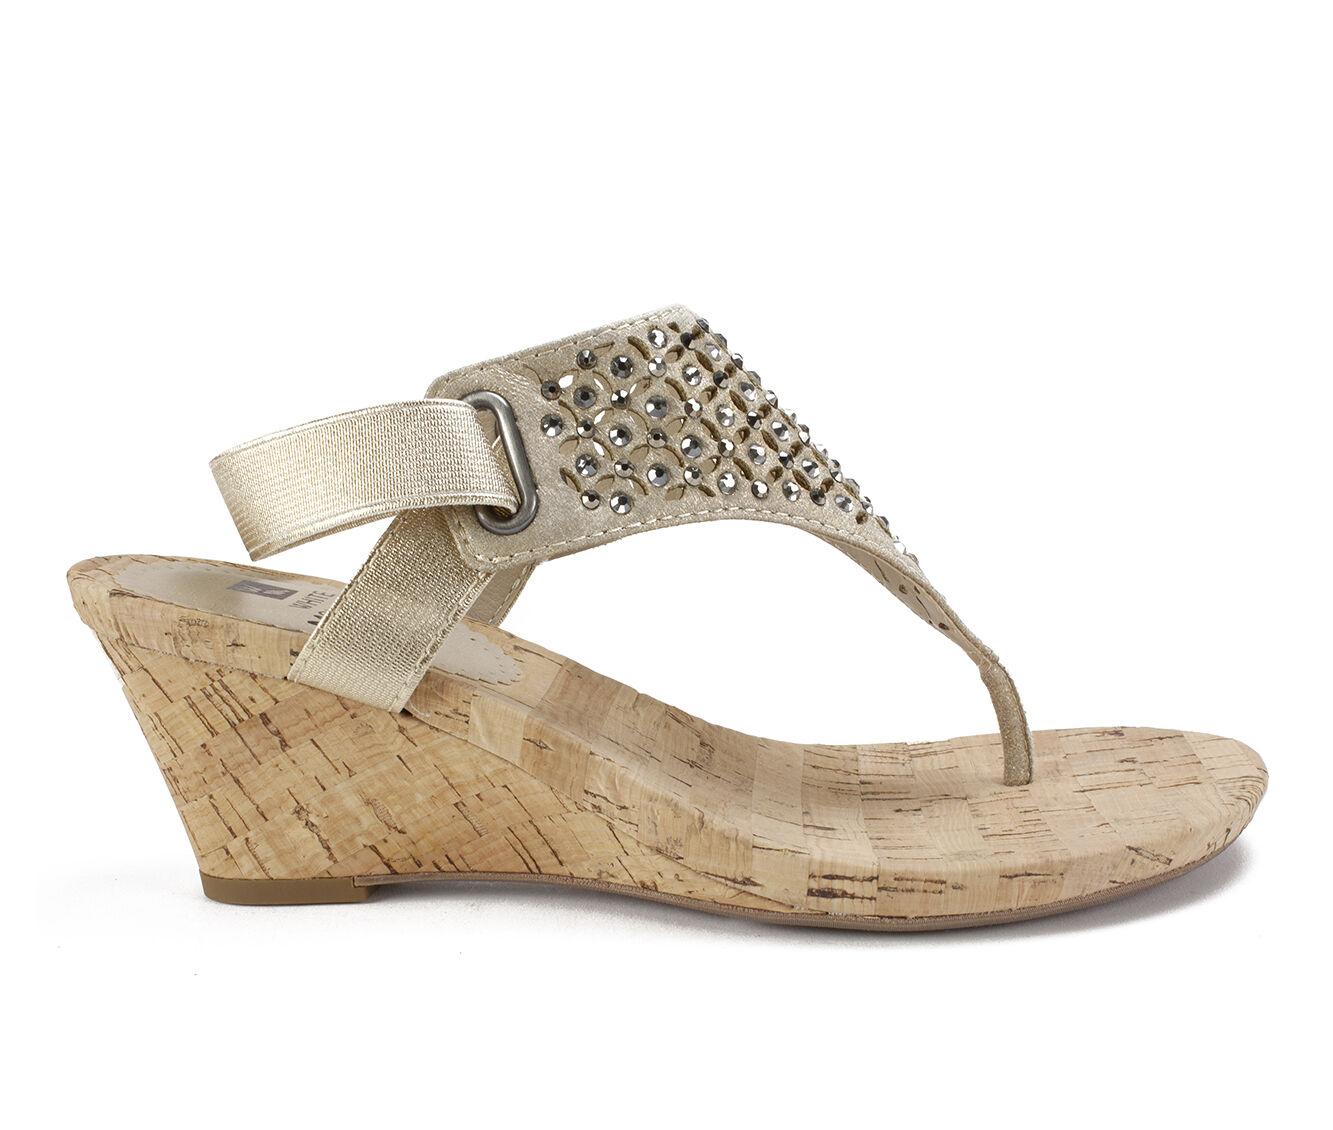 uk shoes_kd6834